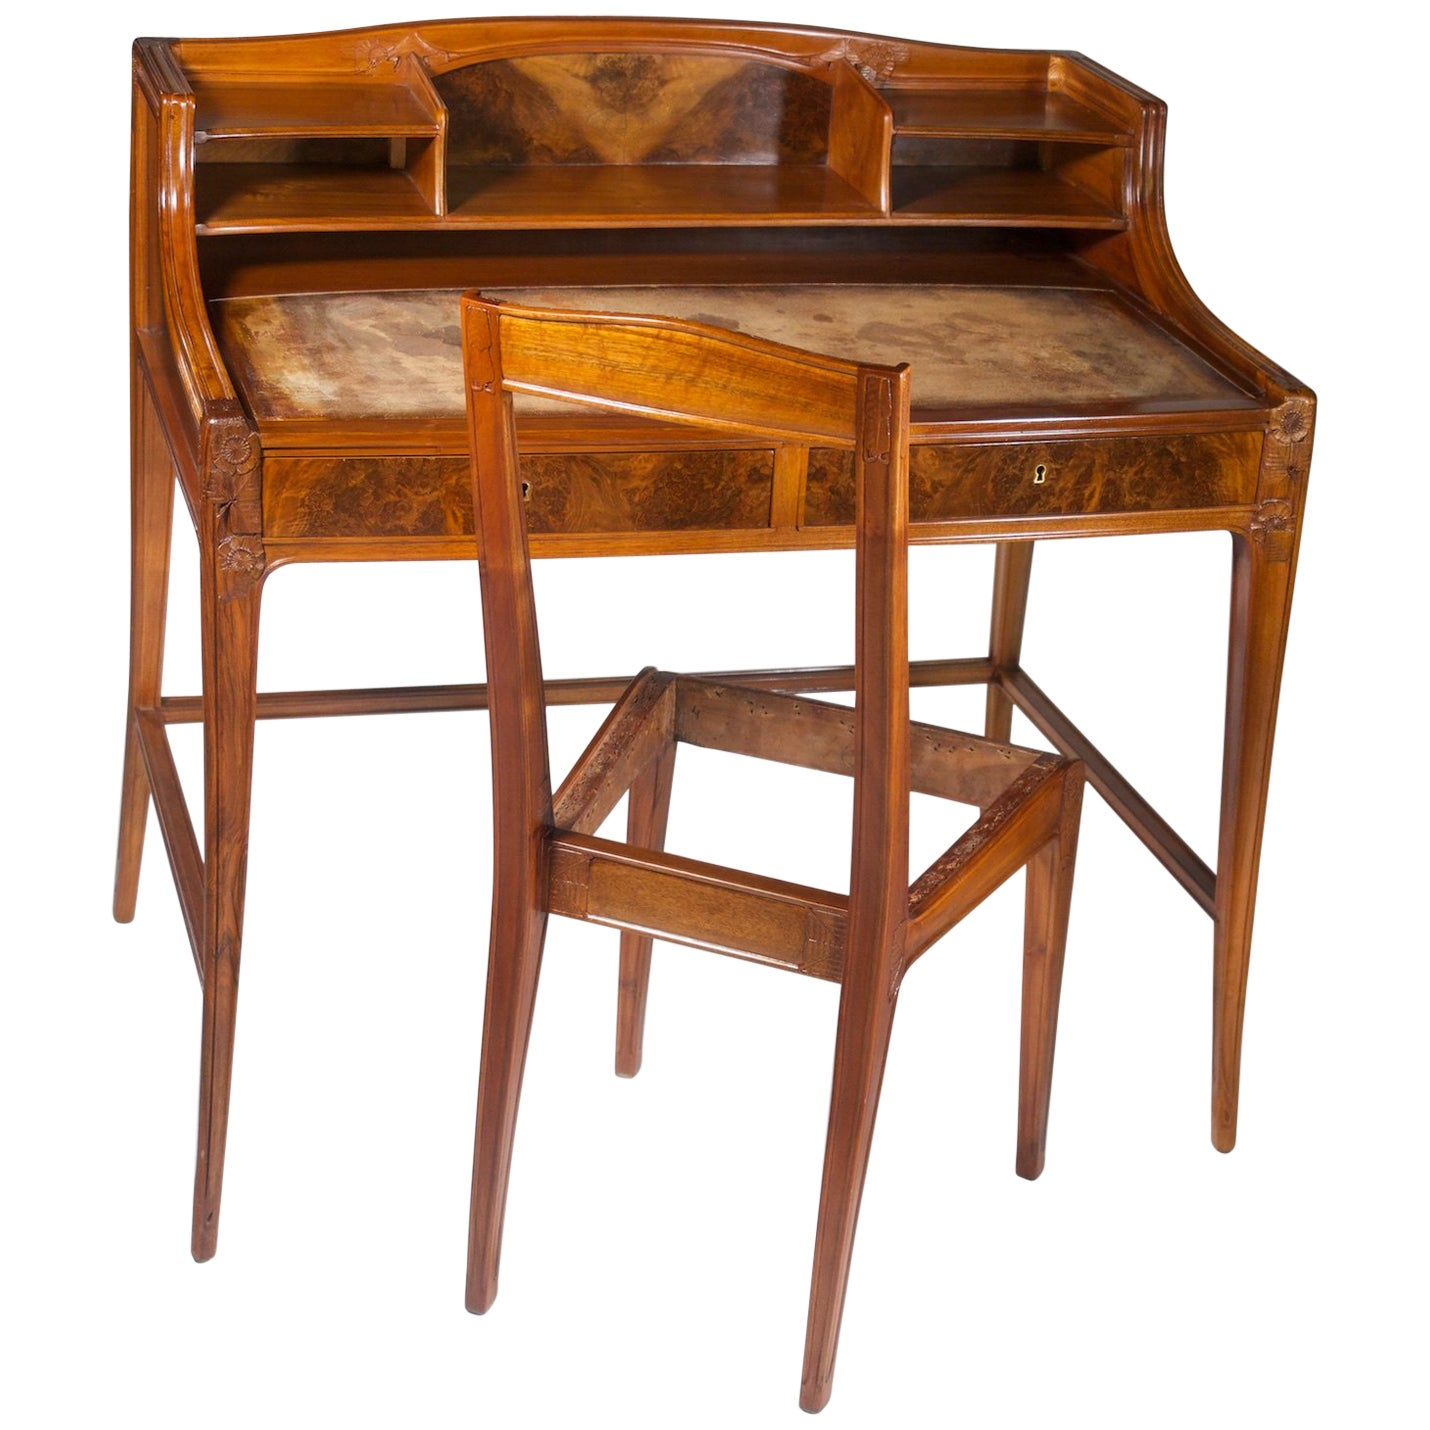 Leon Jallot Sculpted Walnut Desk and Chair